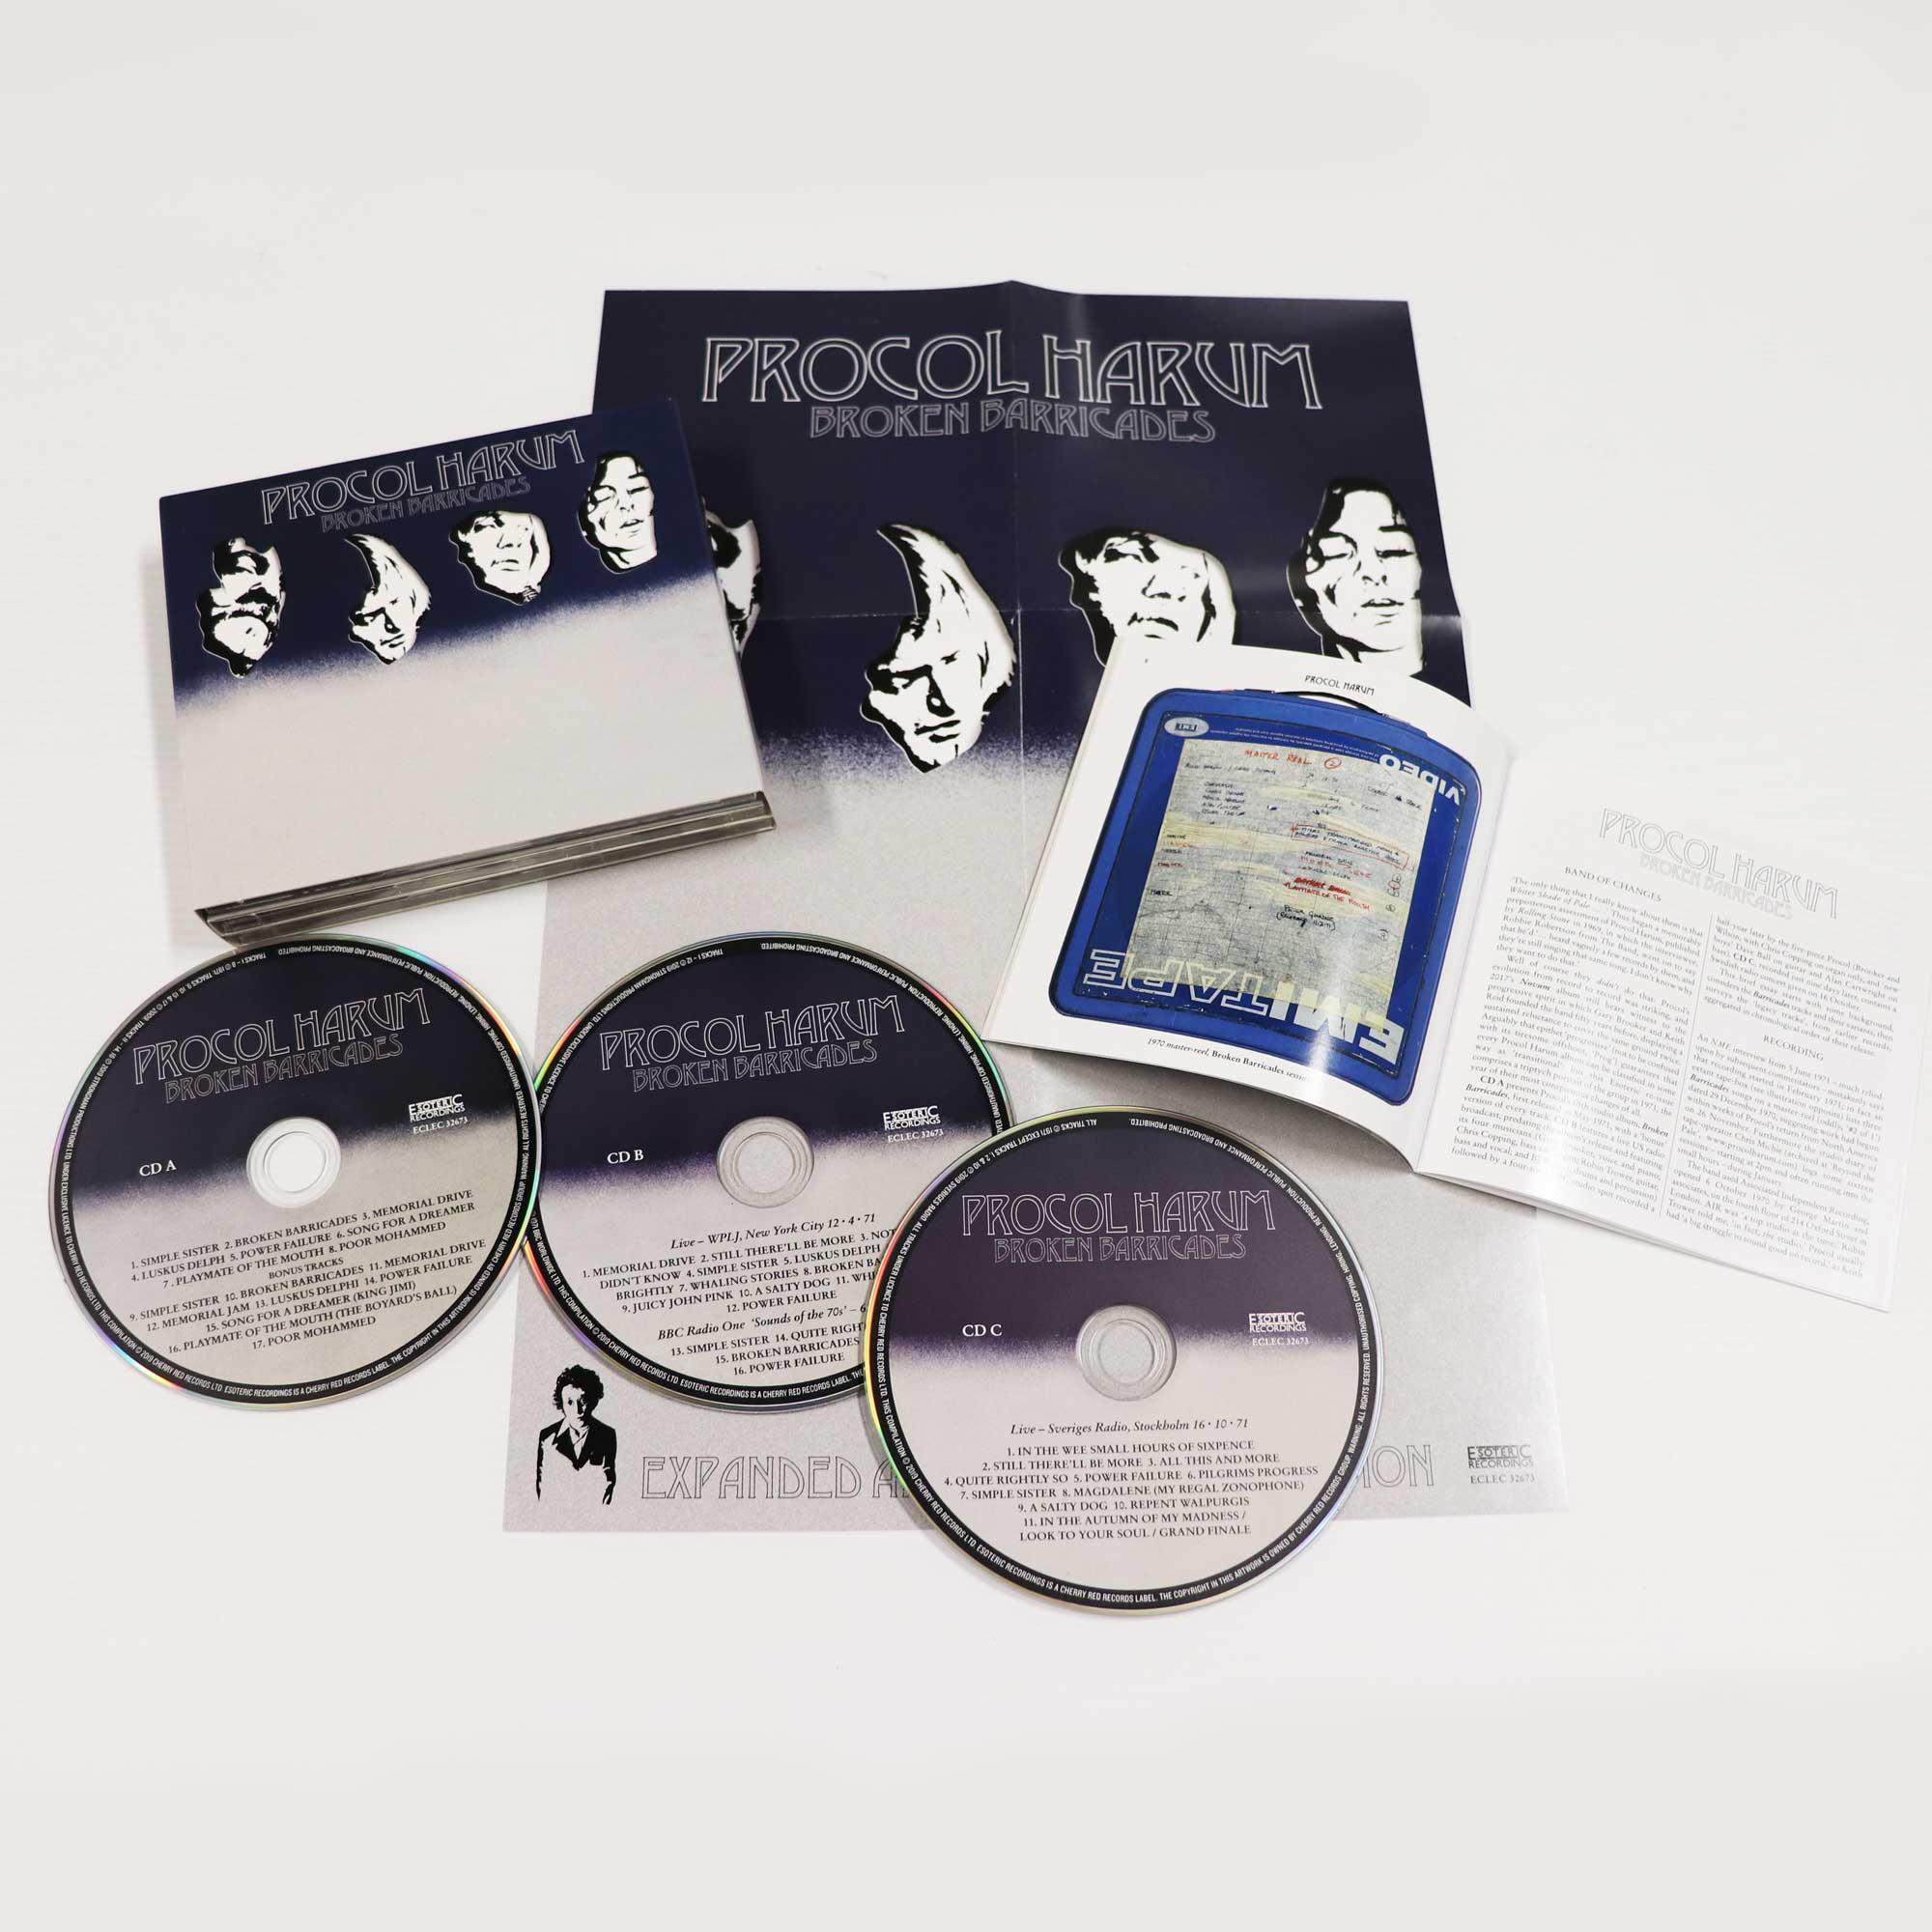 Procol Harum: Broken Barricades, 3CD Remastered & Expanded Boxset Edition